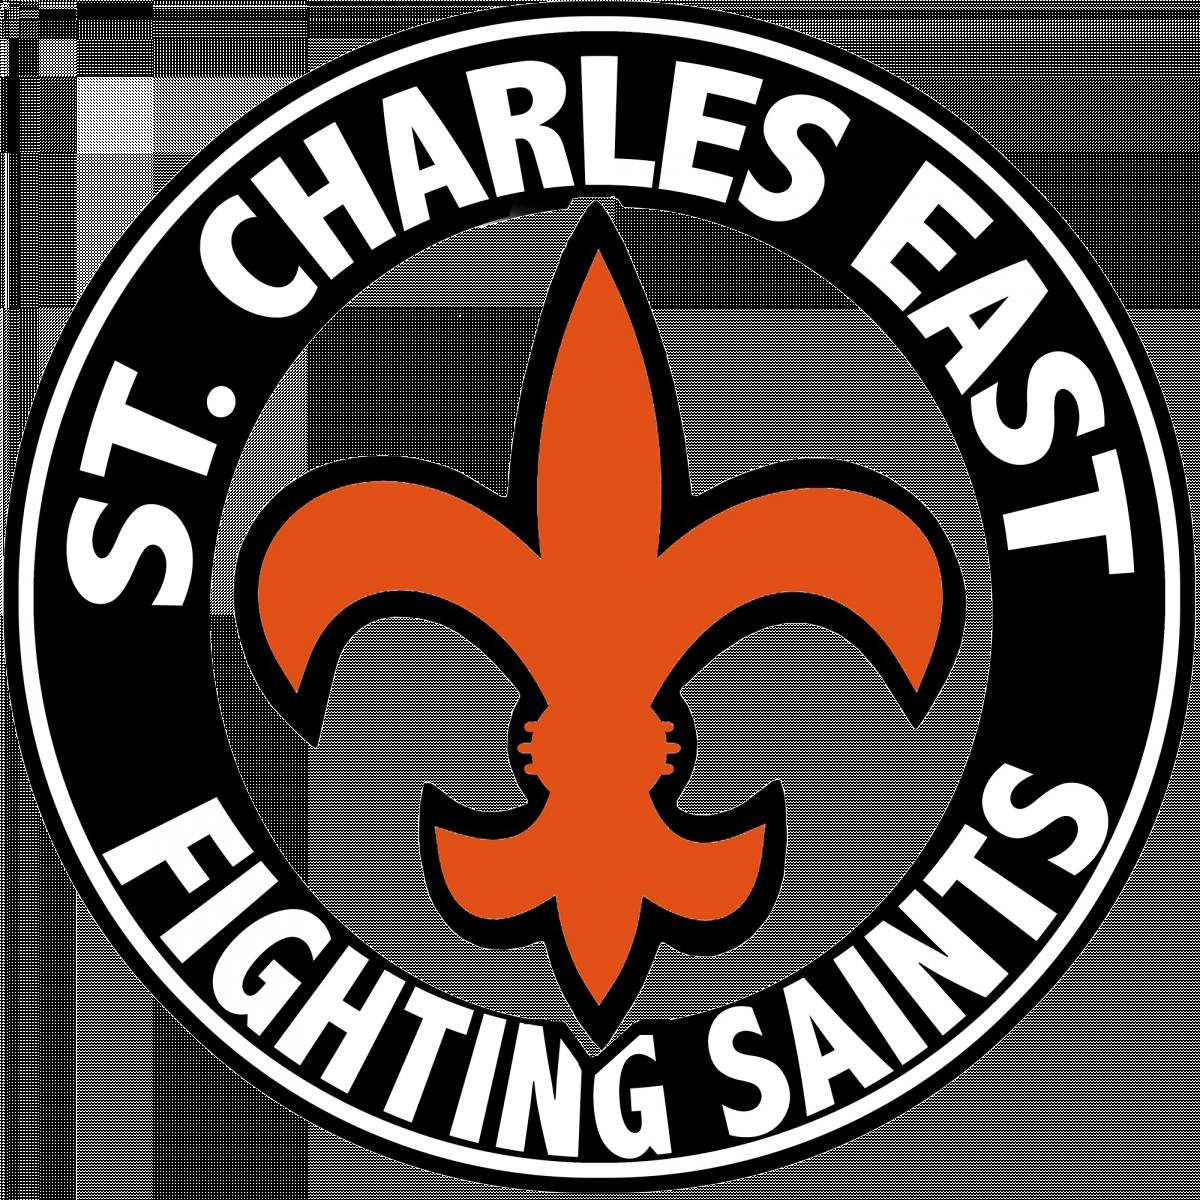 St. Charles E.